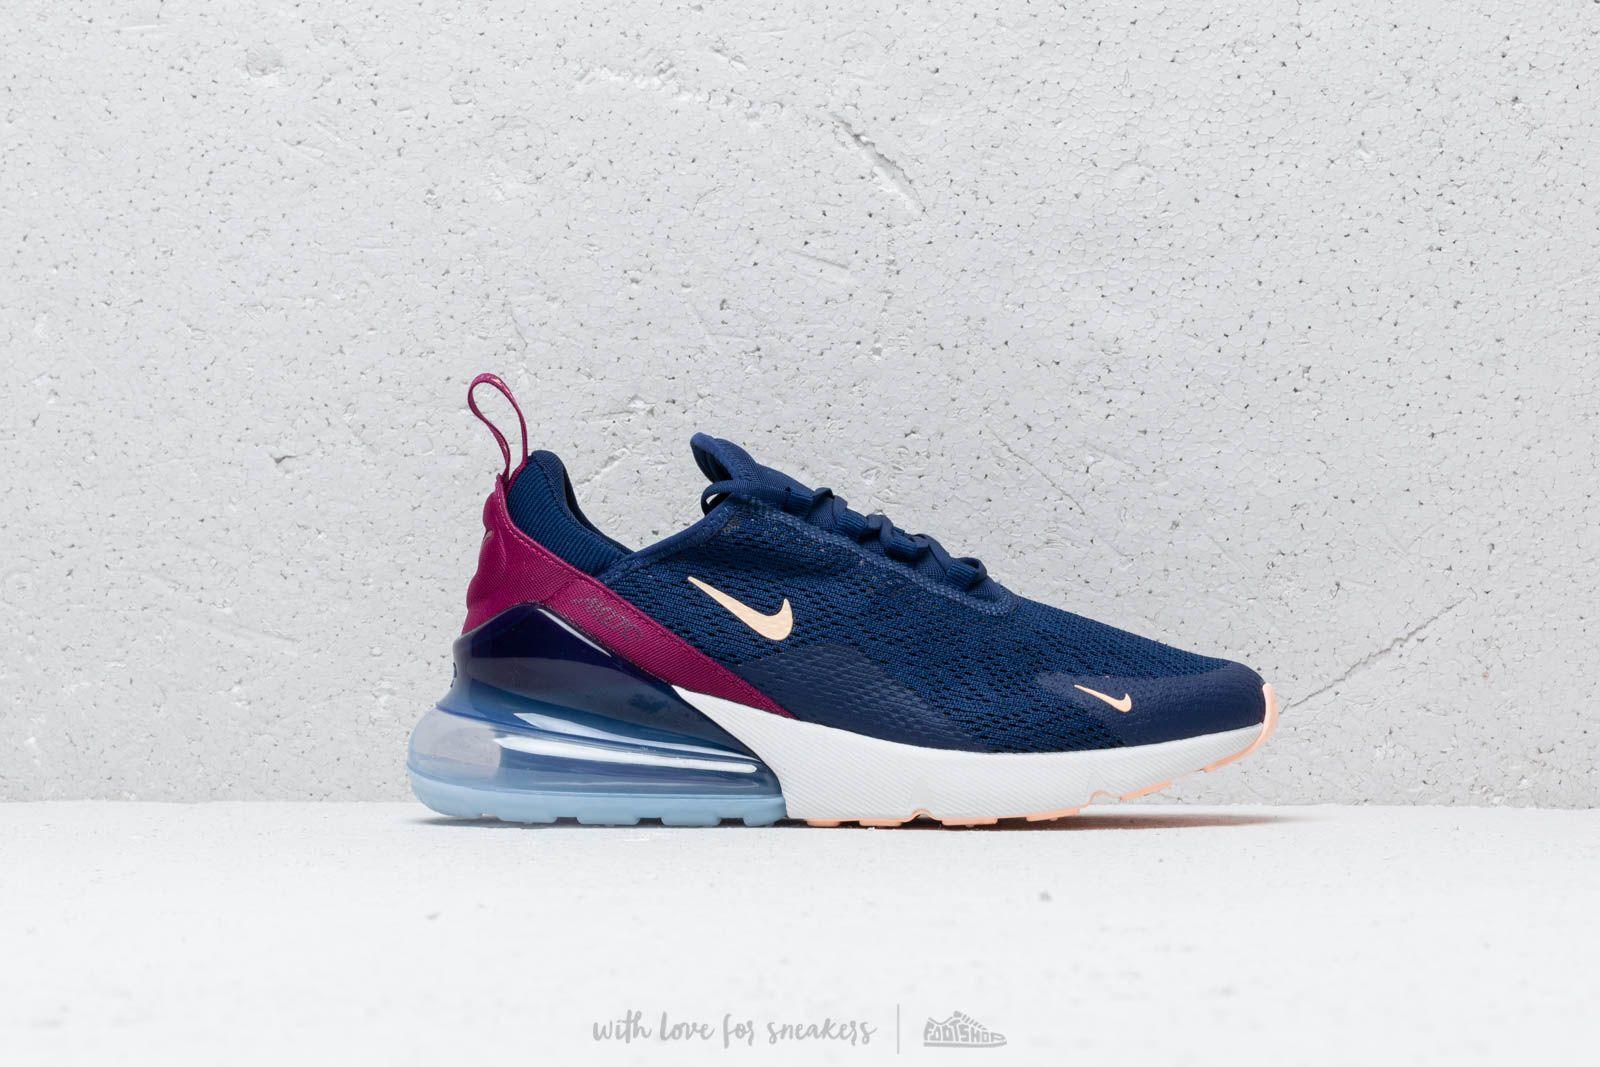 b4a3585782 Nike W Air Max 270 Blue Void/ Crimson Tint-True Berry at a great